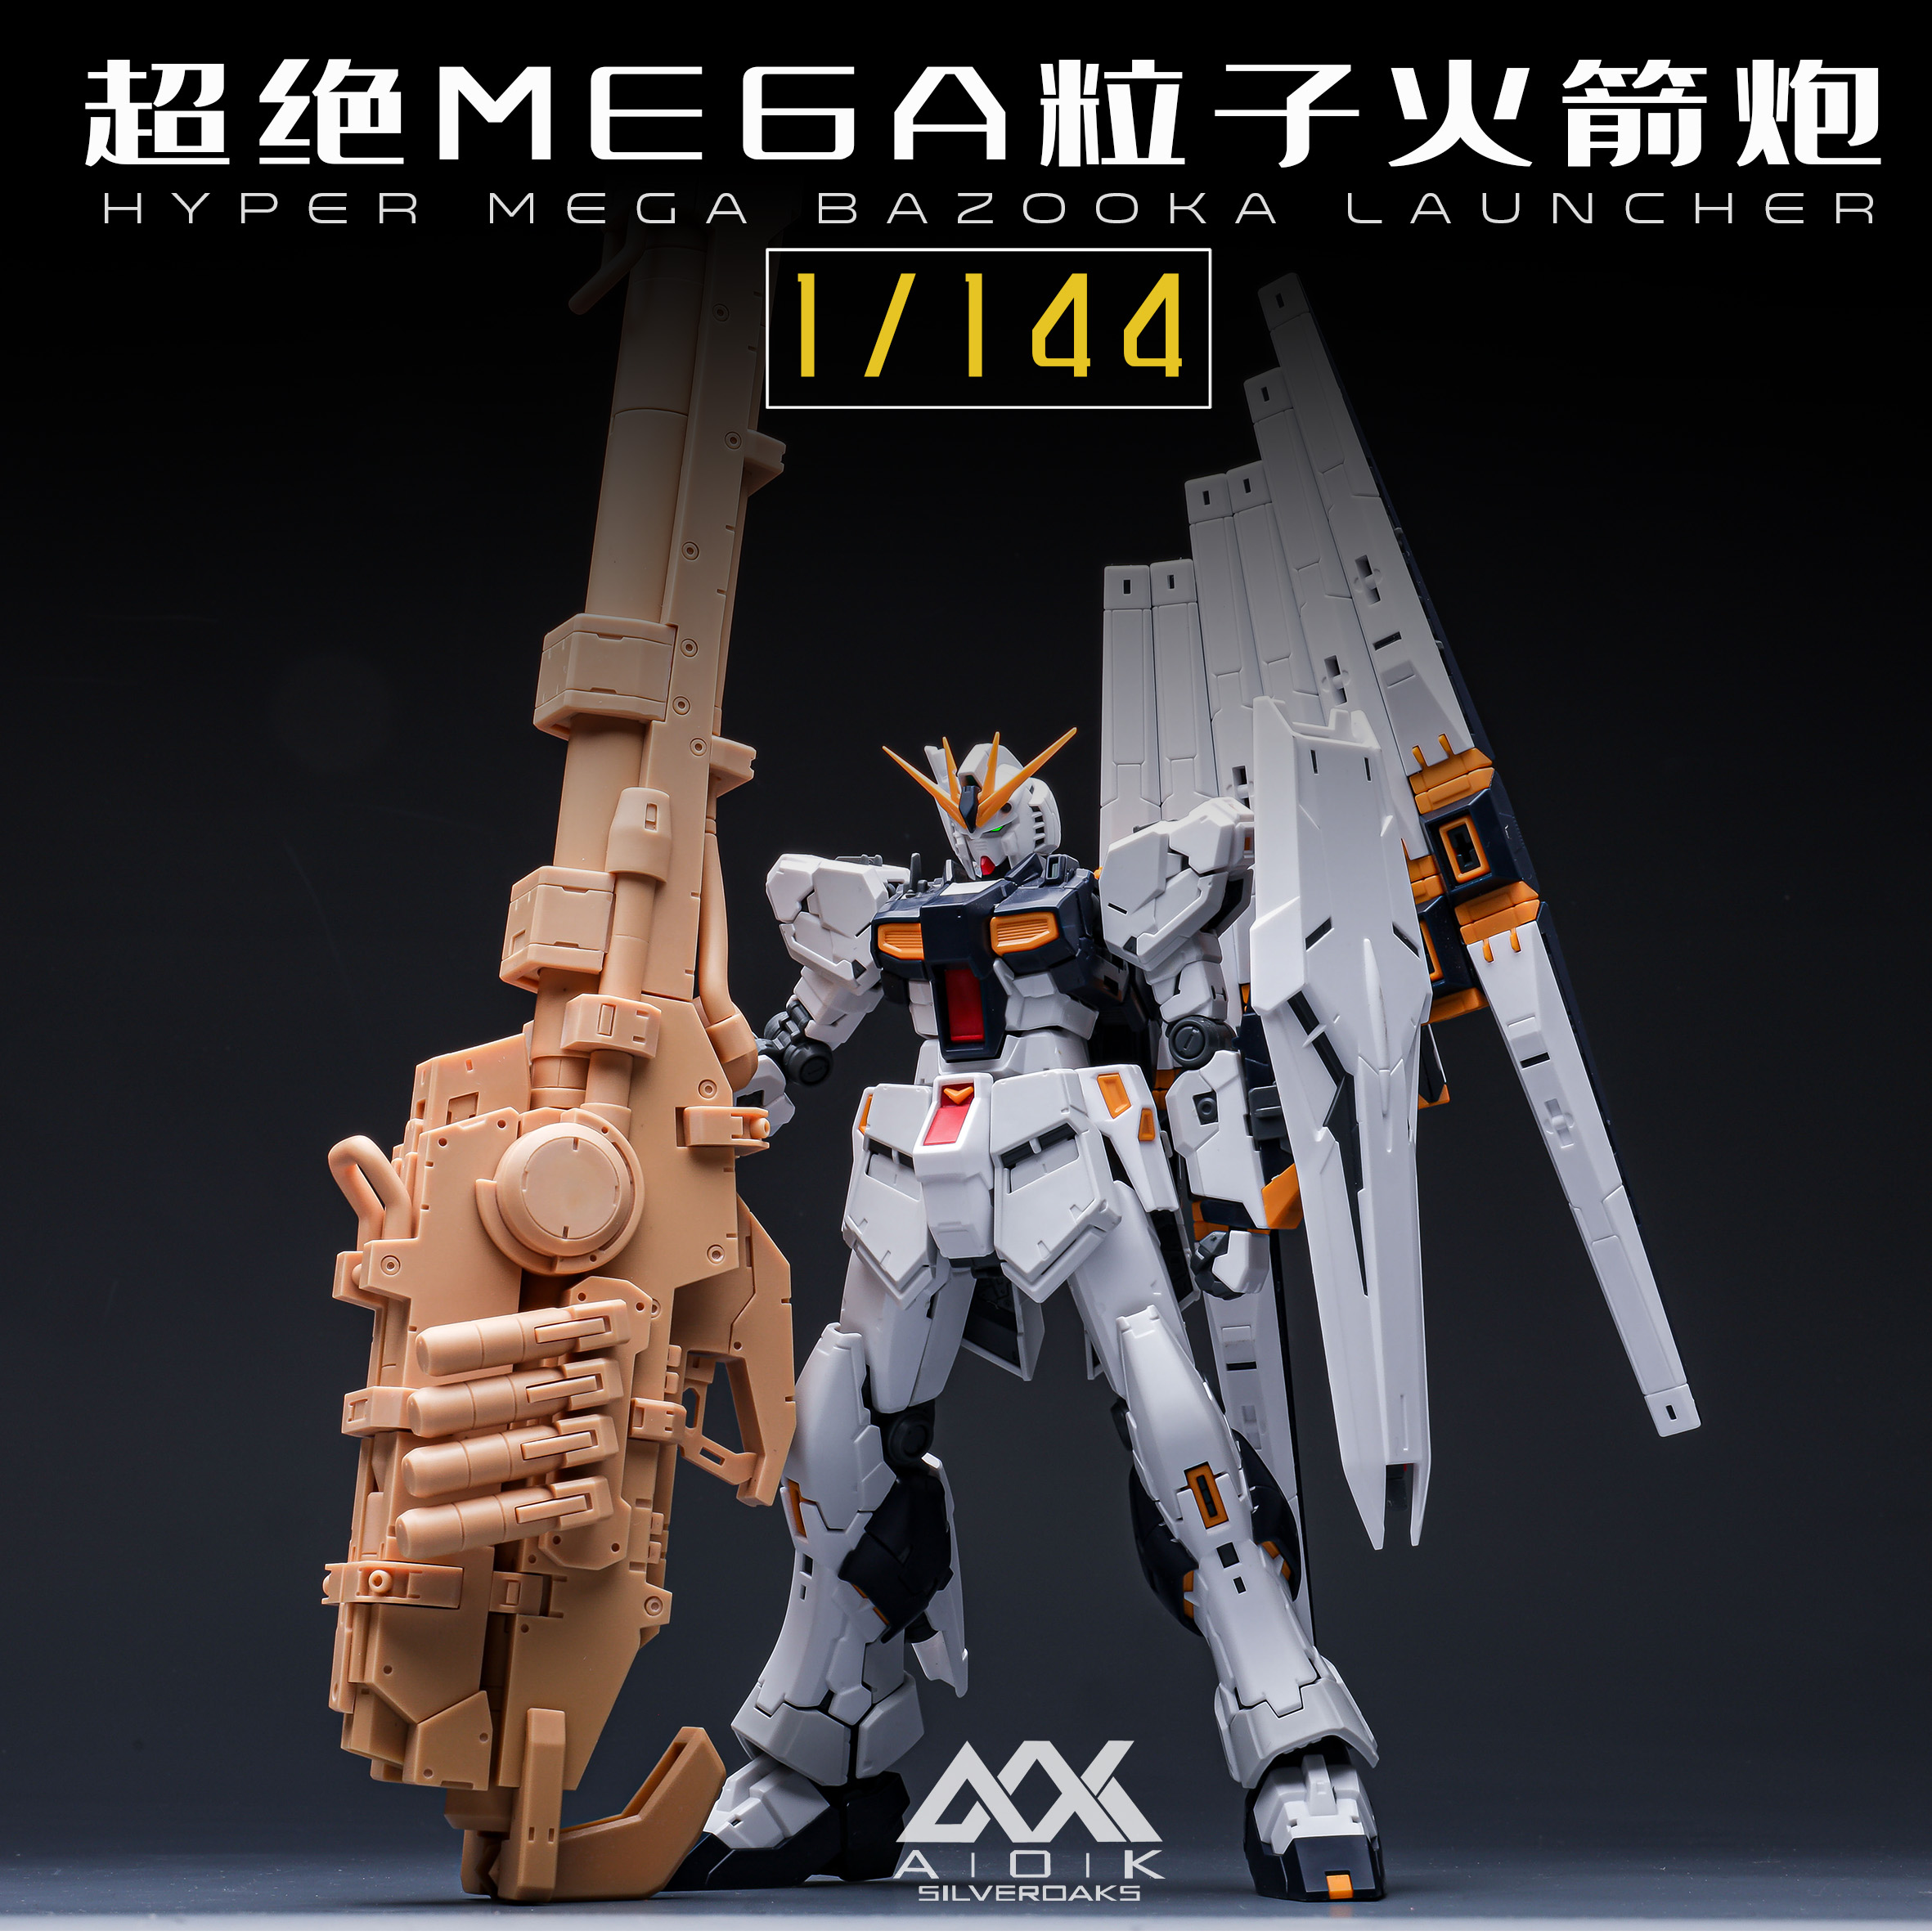 G788_AOK_silveroaks_RG_HG_nu_mega_launcher_001.jpg